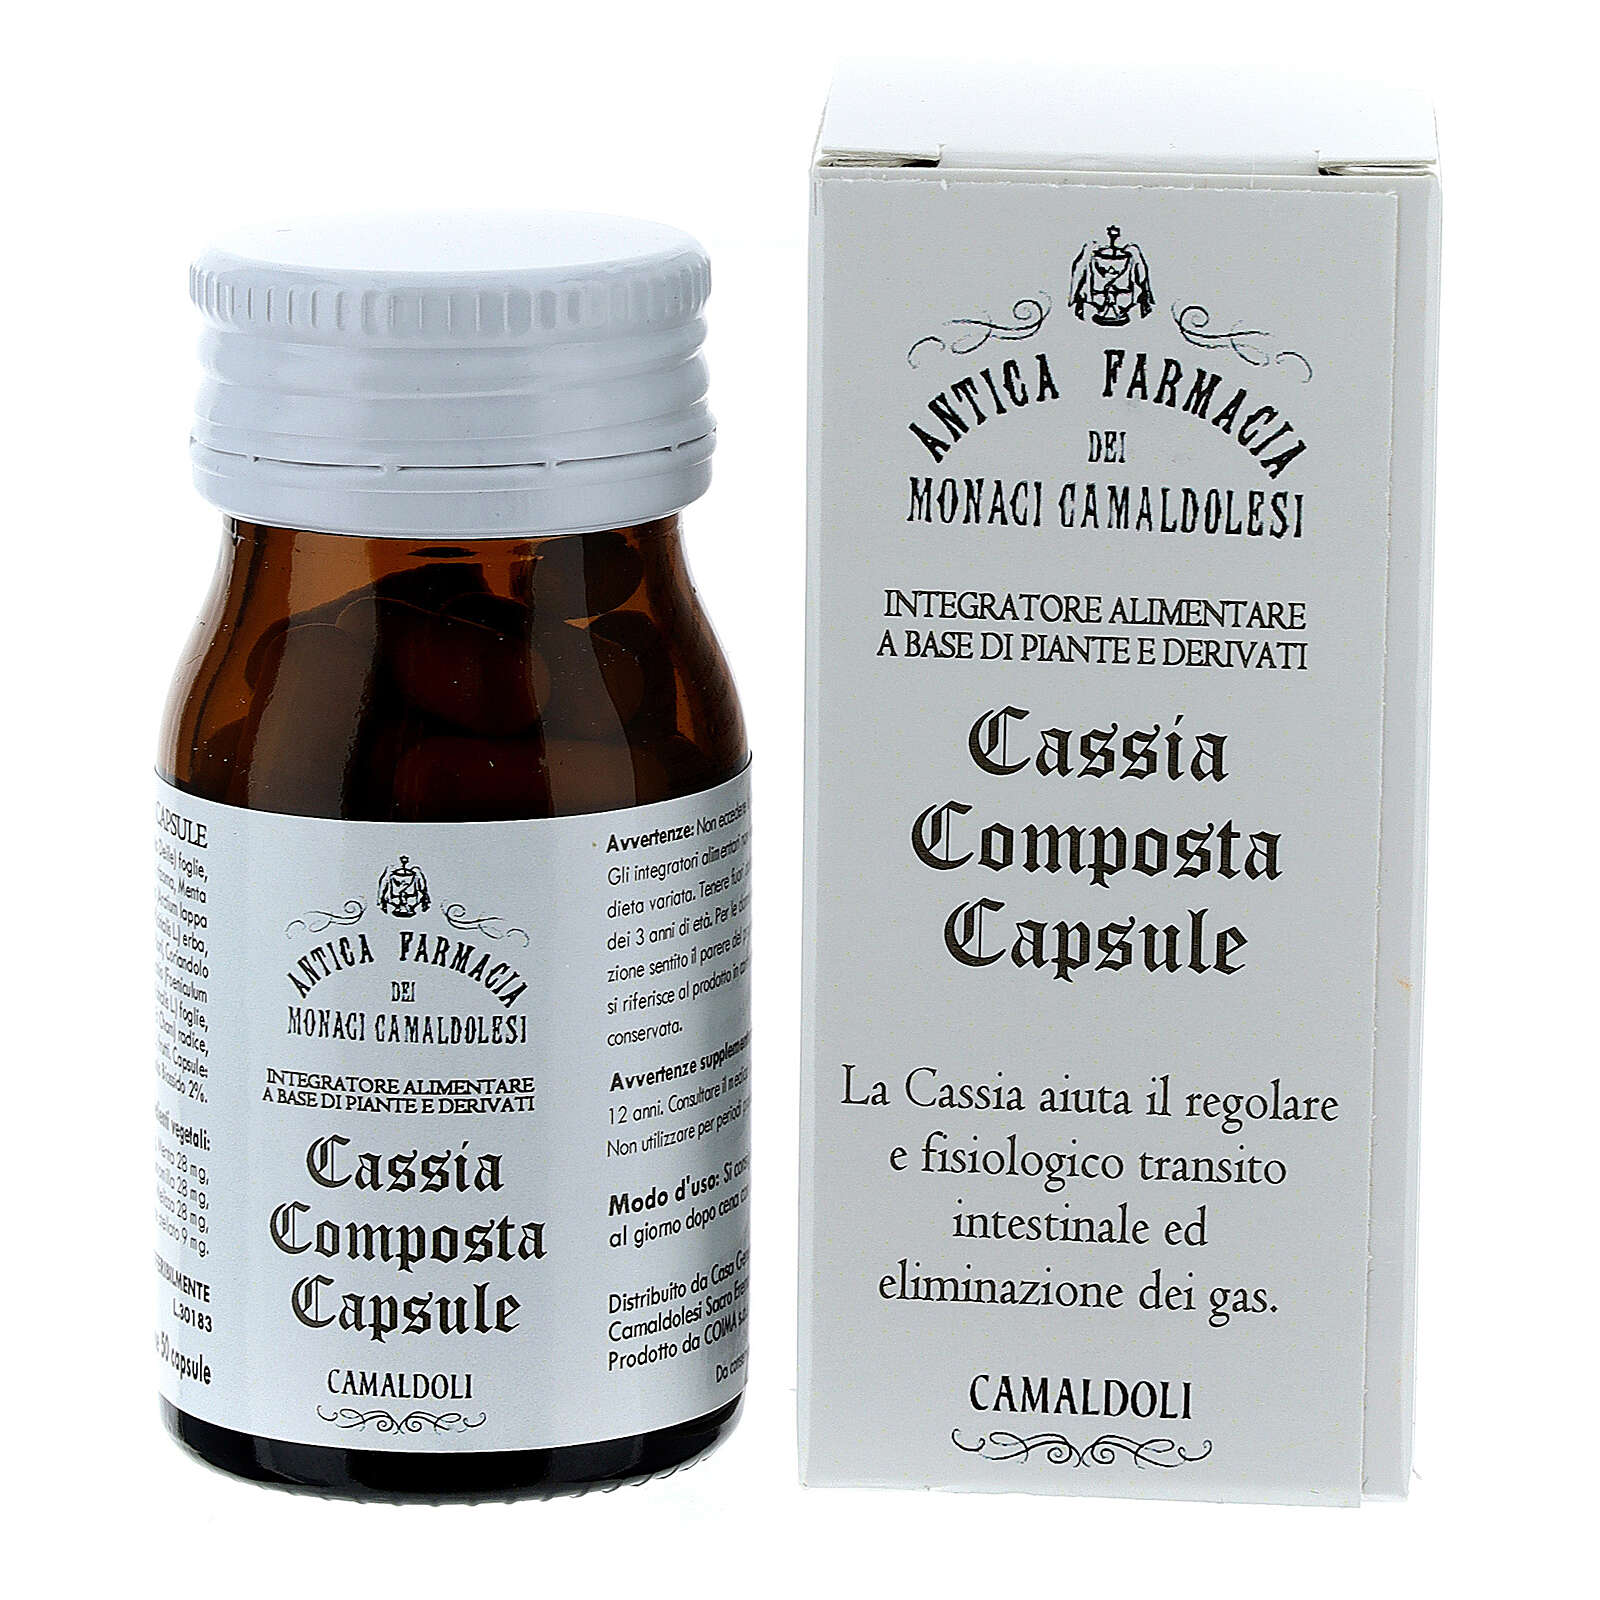 Integratore Cassia Composta capsule 50 pz Camaldoli 3